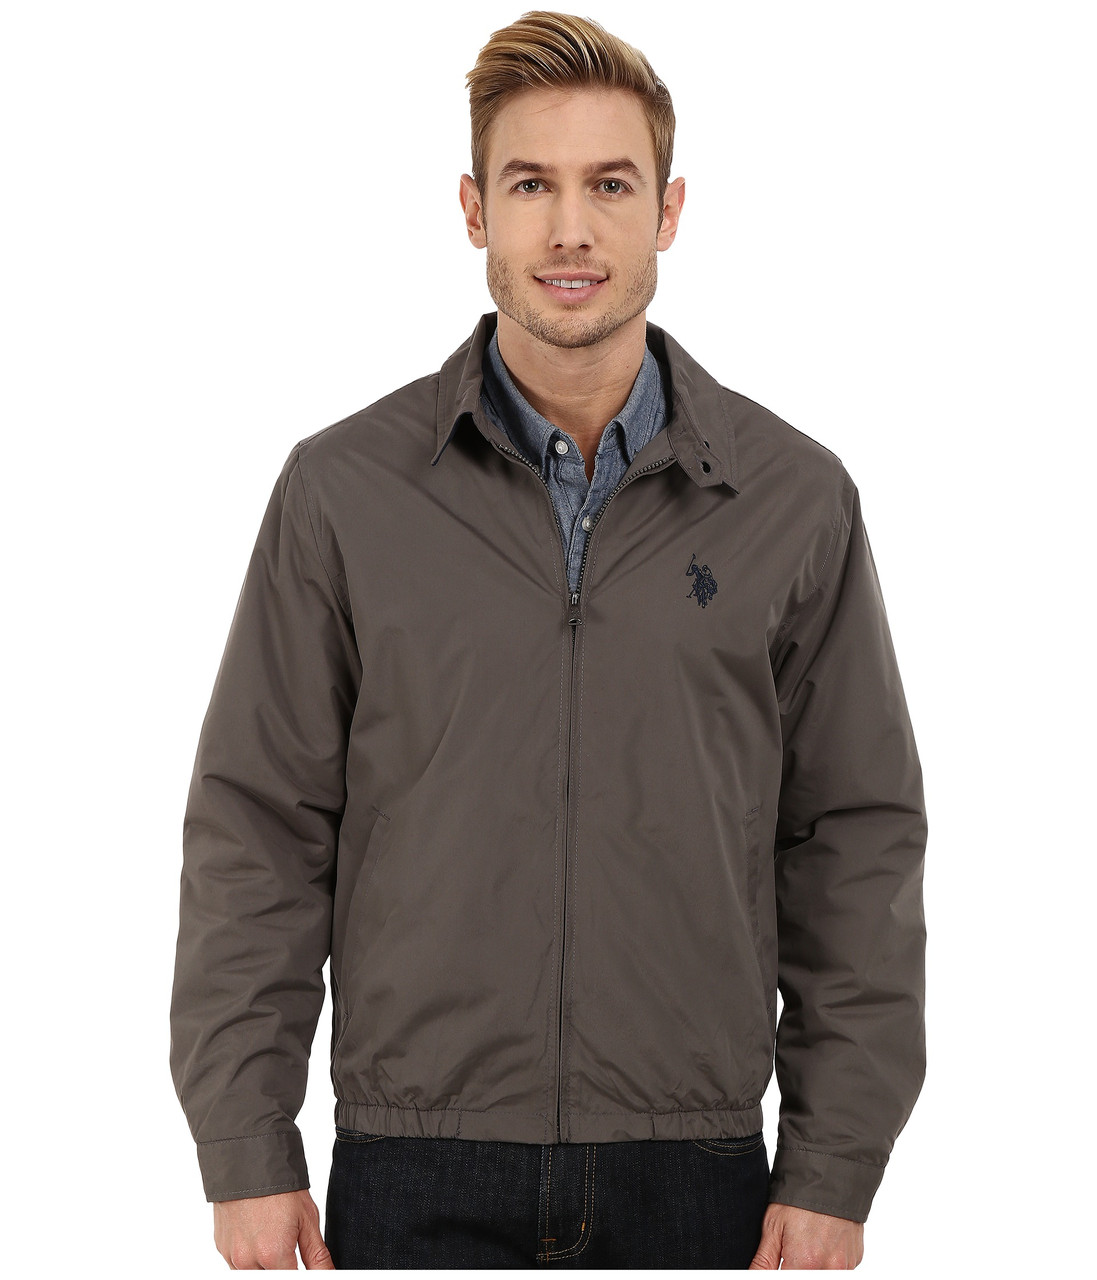 Куртка U.S. Polo Assn., L, Castle Rock, 105530P3-CSRK